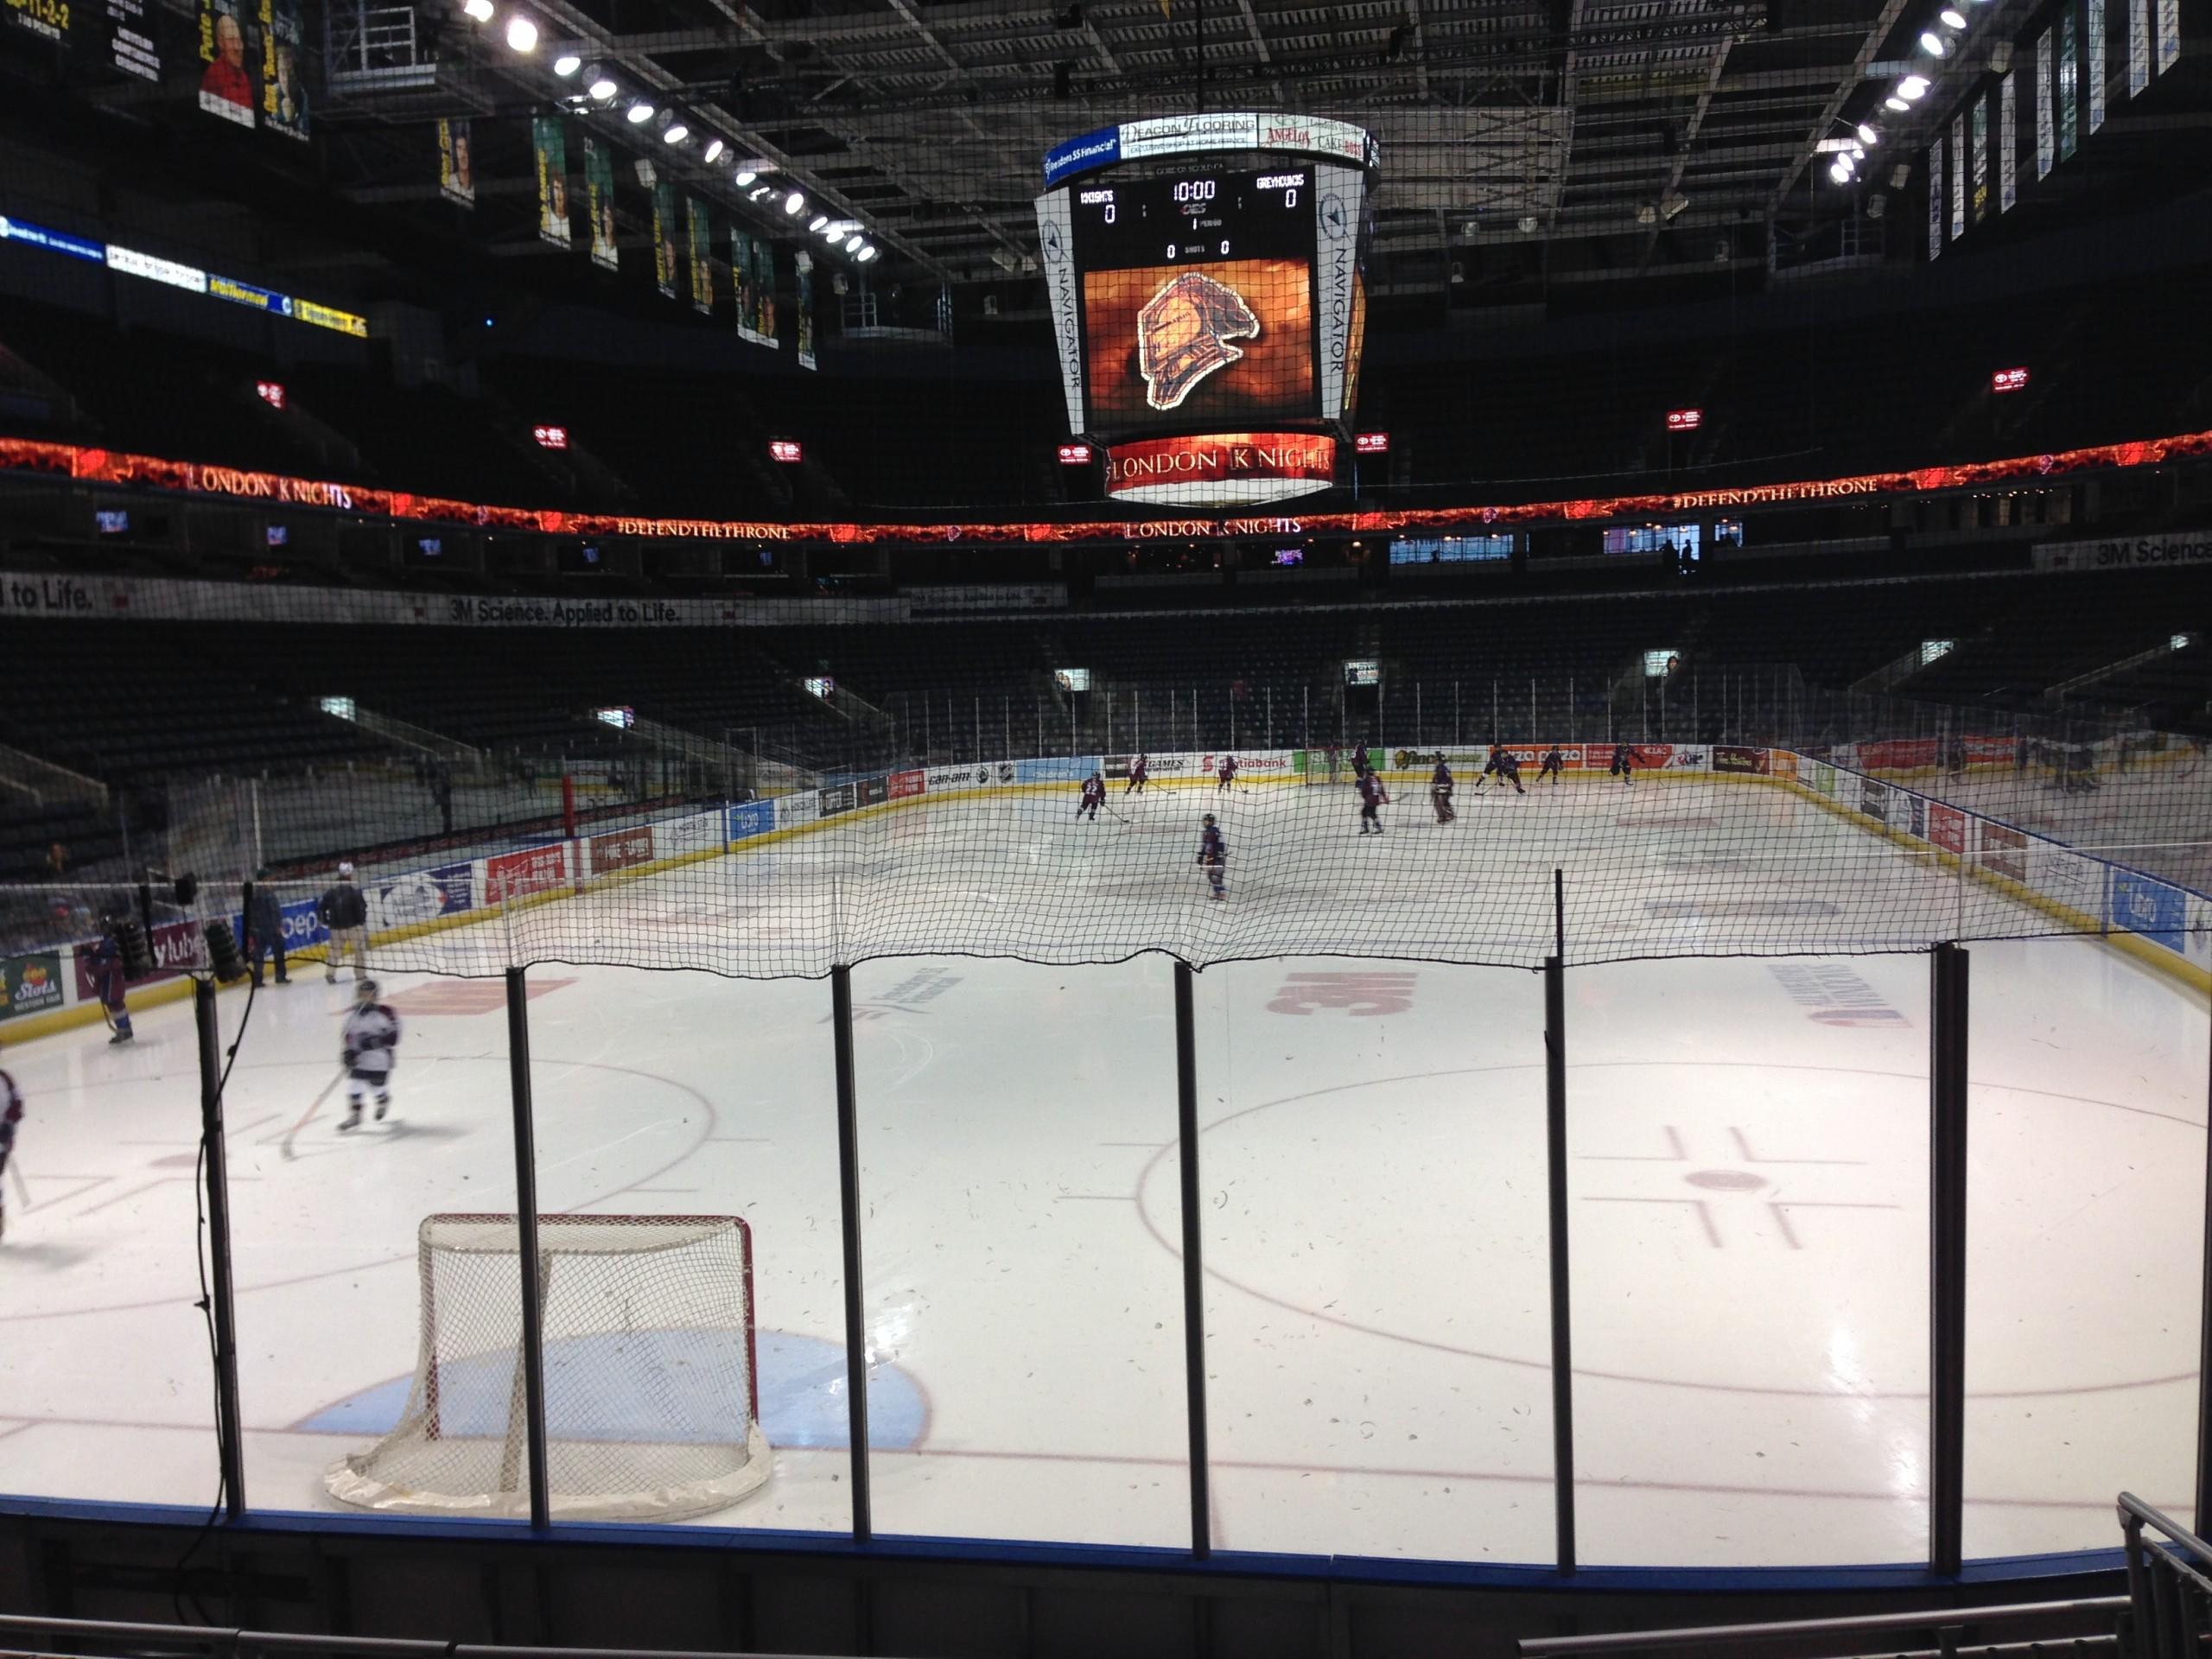 London-Windsor best fit for World Junior Hockey tournament